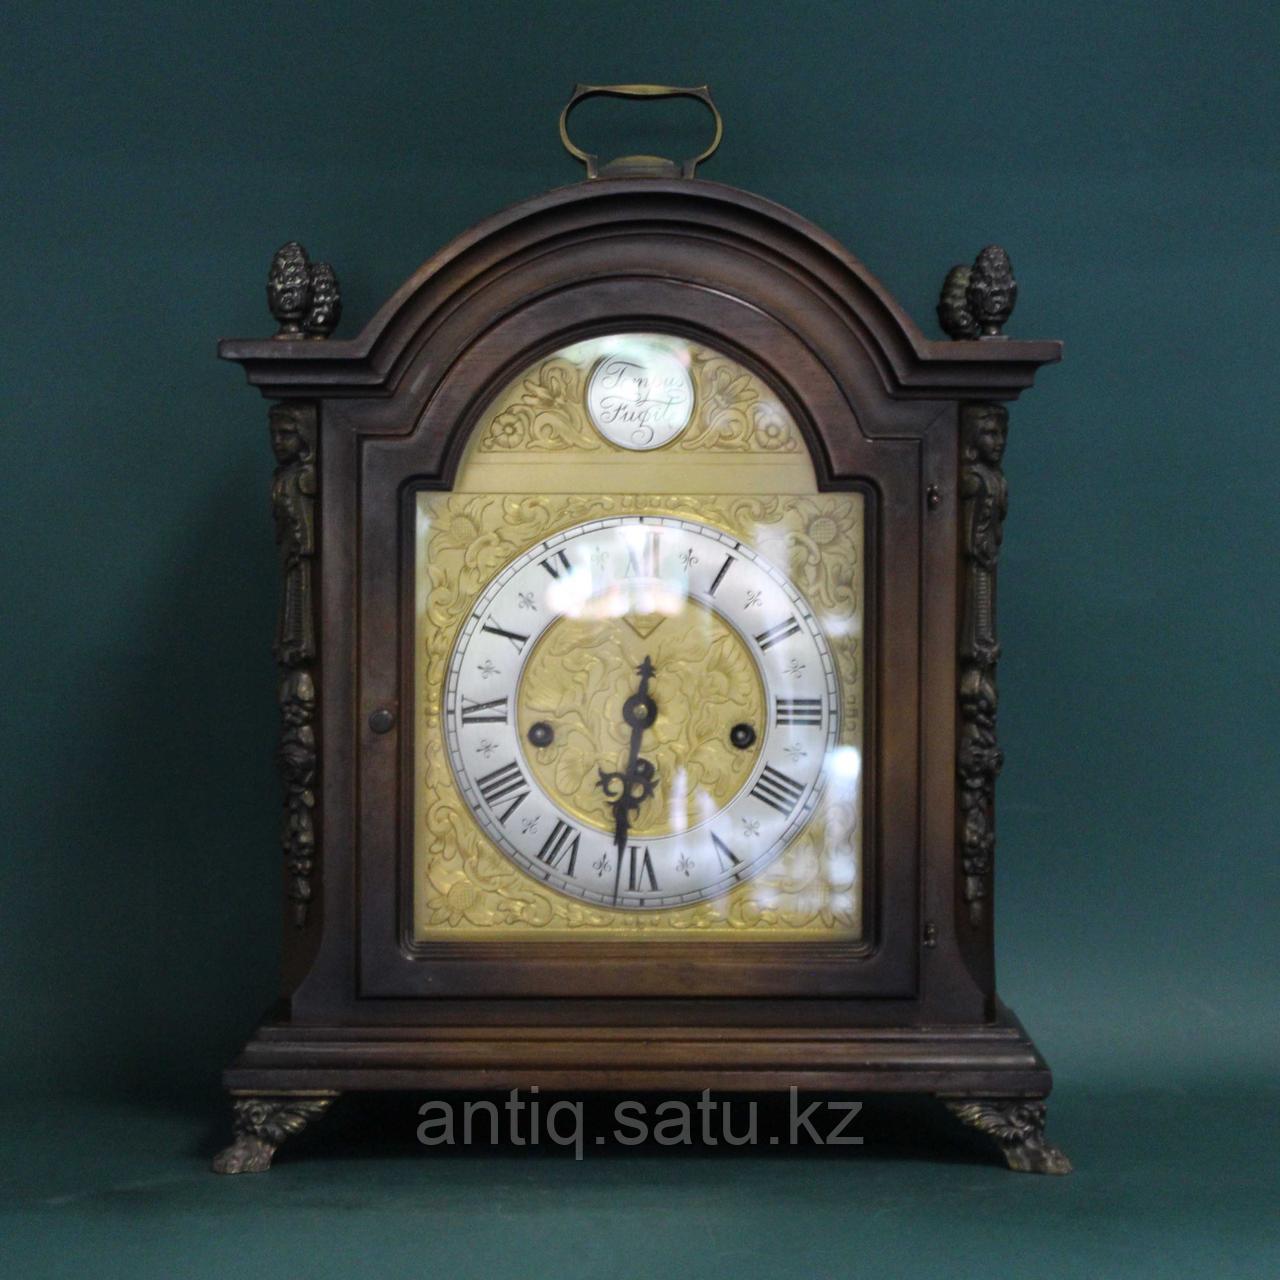 Настольные часы Часовая мастерская Emil Schmeckenbecher - фото 7